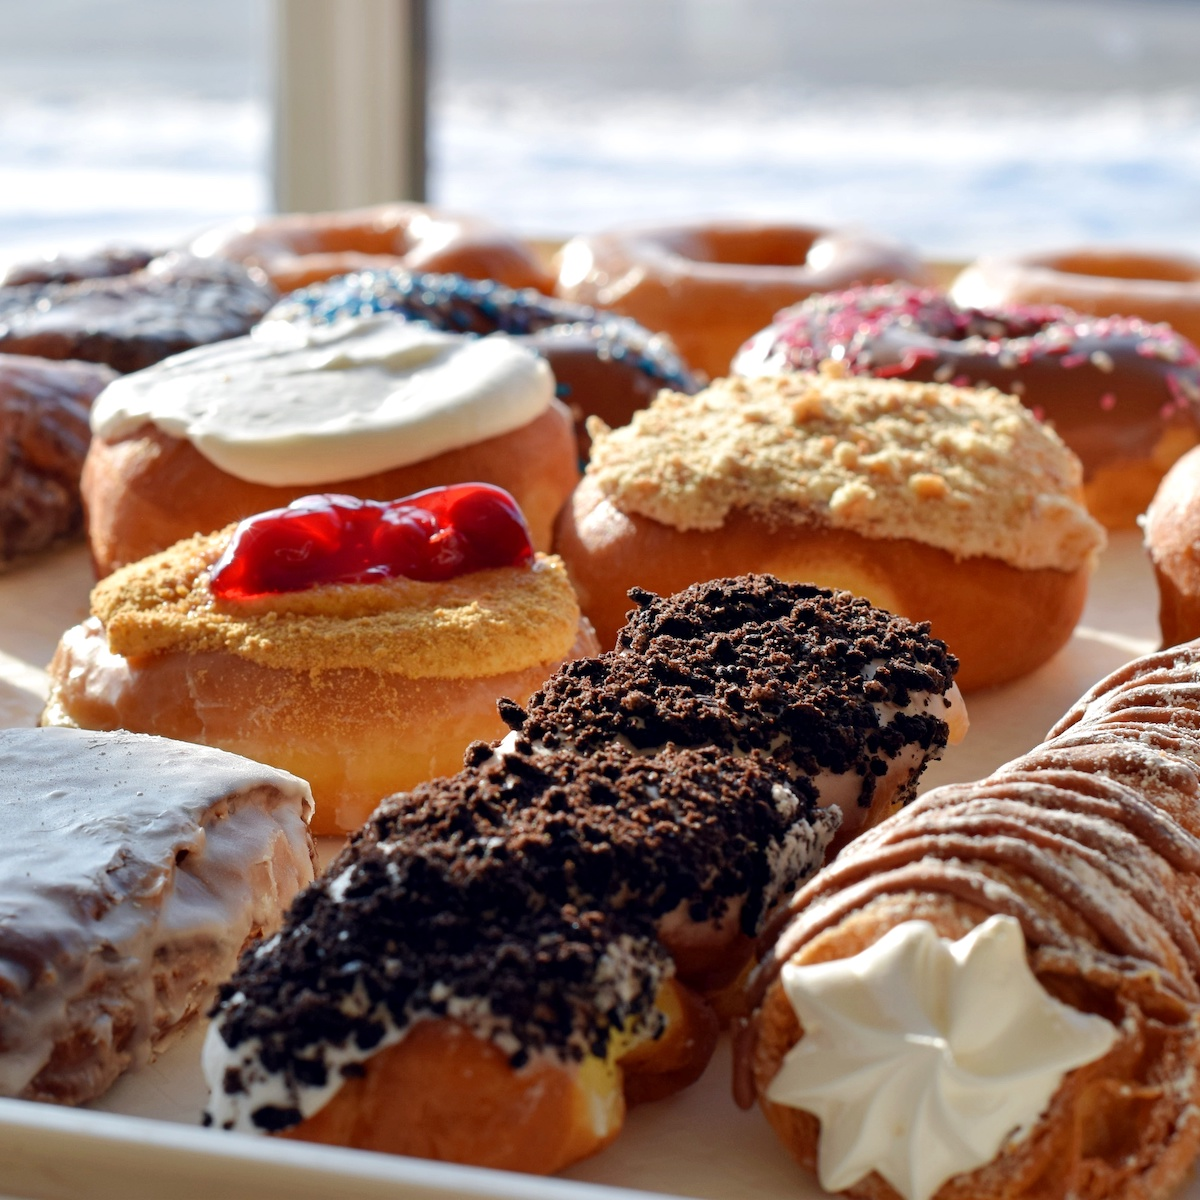 Donut display at Martin's Donut Shop